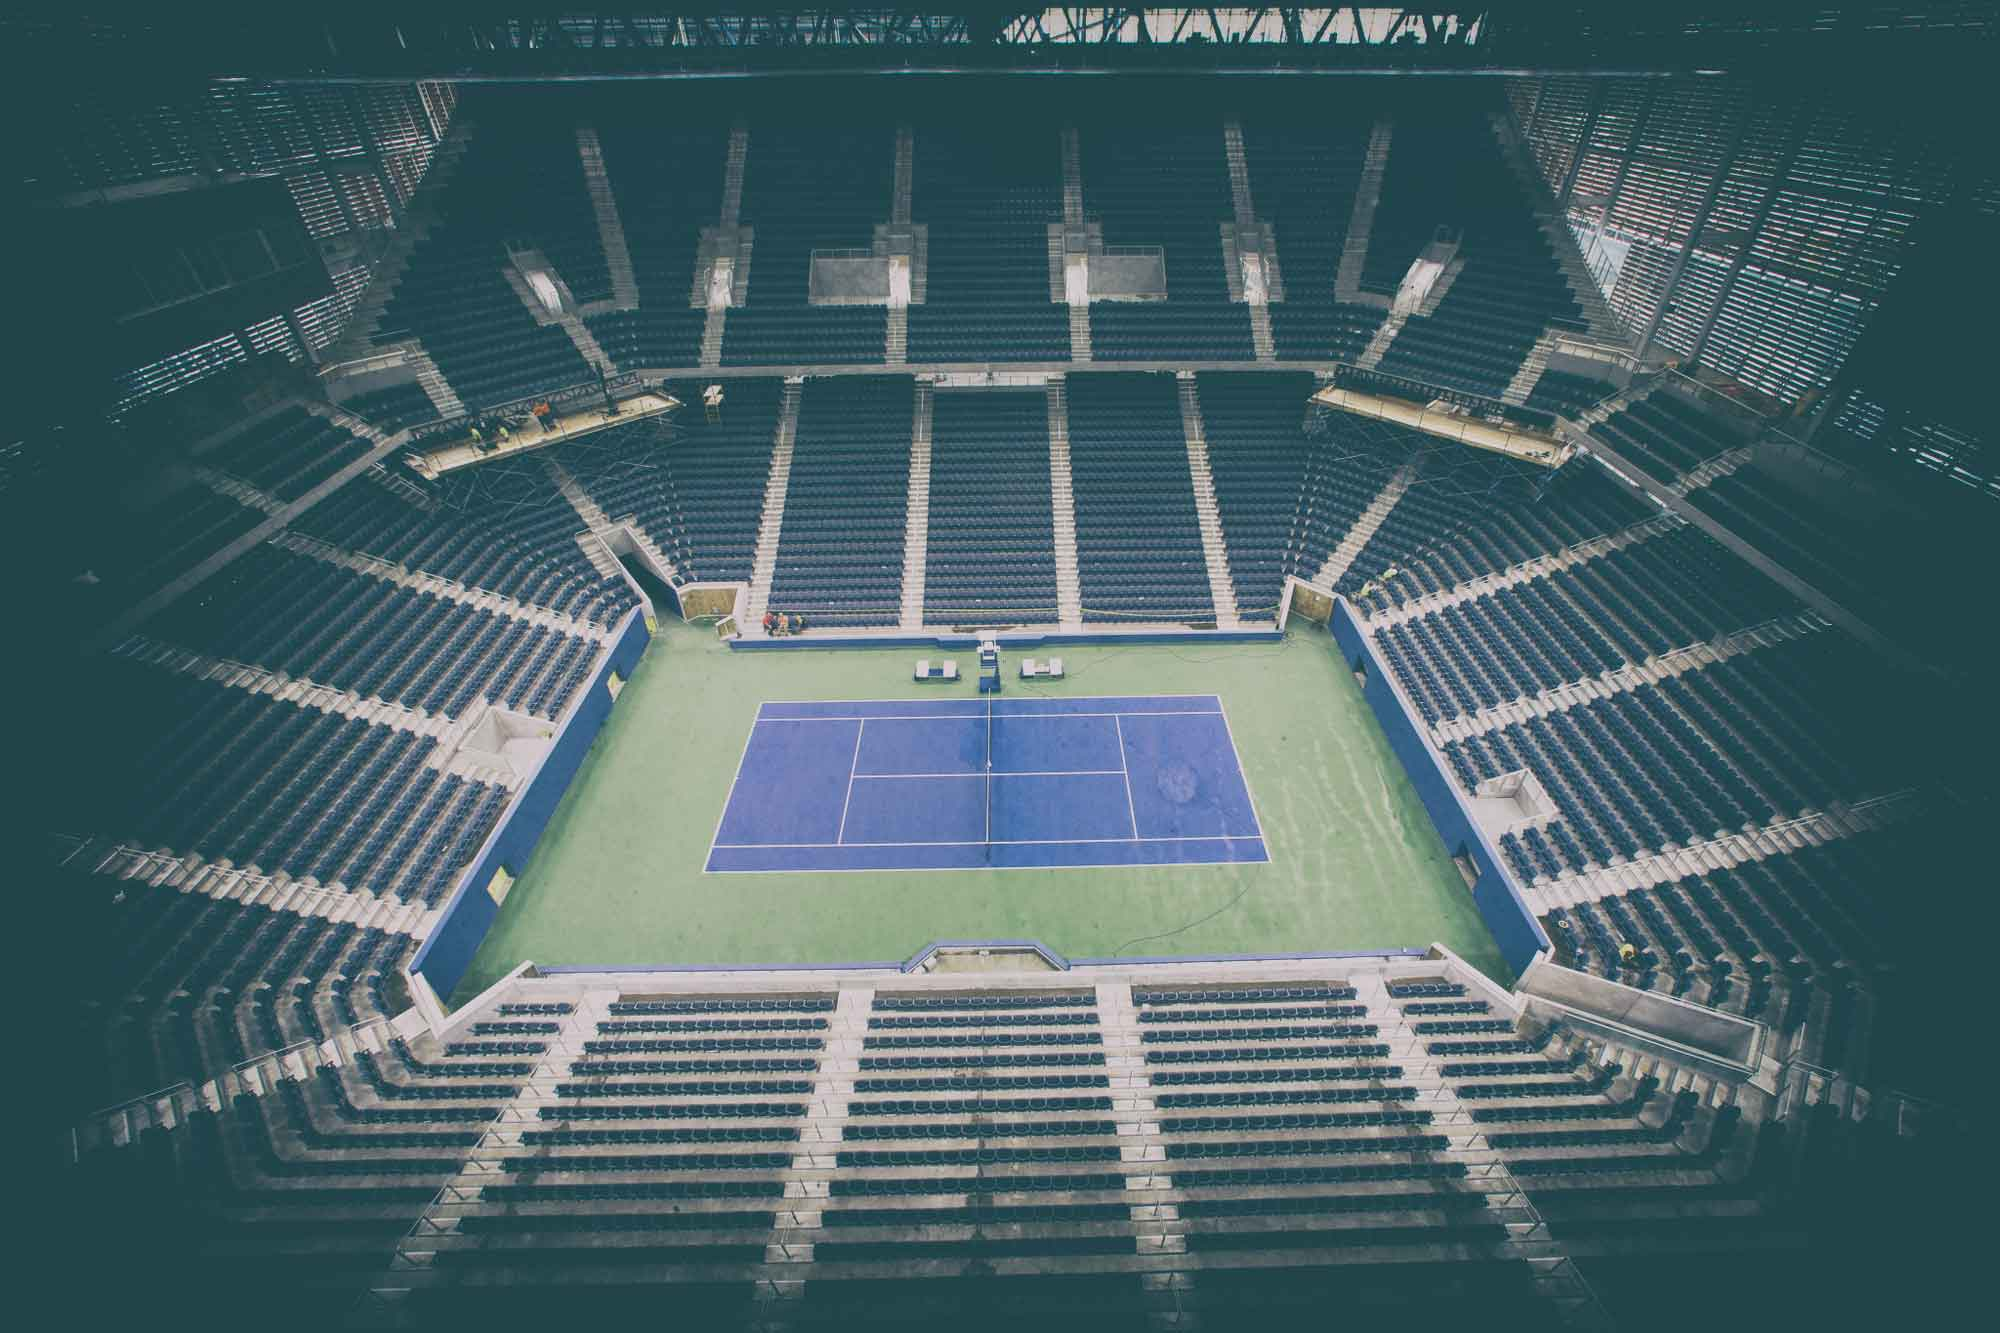 native-son-dc-tennis-us-open-empty-stadium